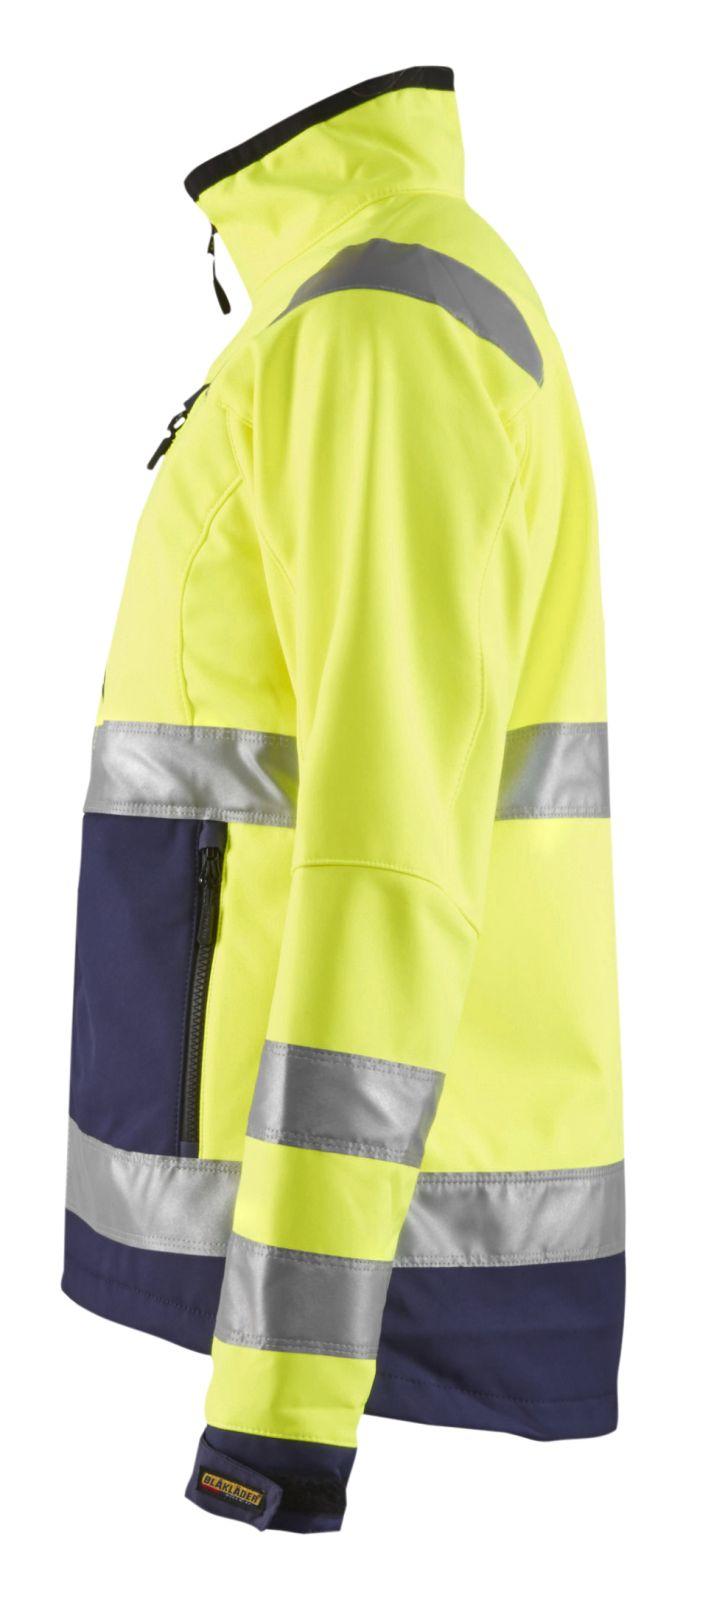 Blaklader Dames softshell jacks 49022517 High Vis geel-marineblauw(3389)